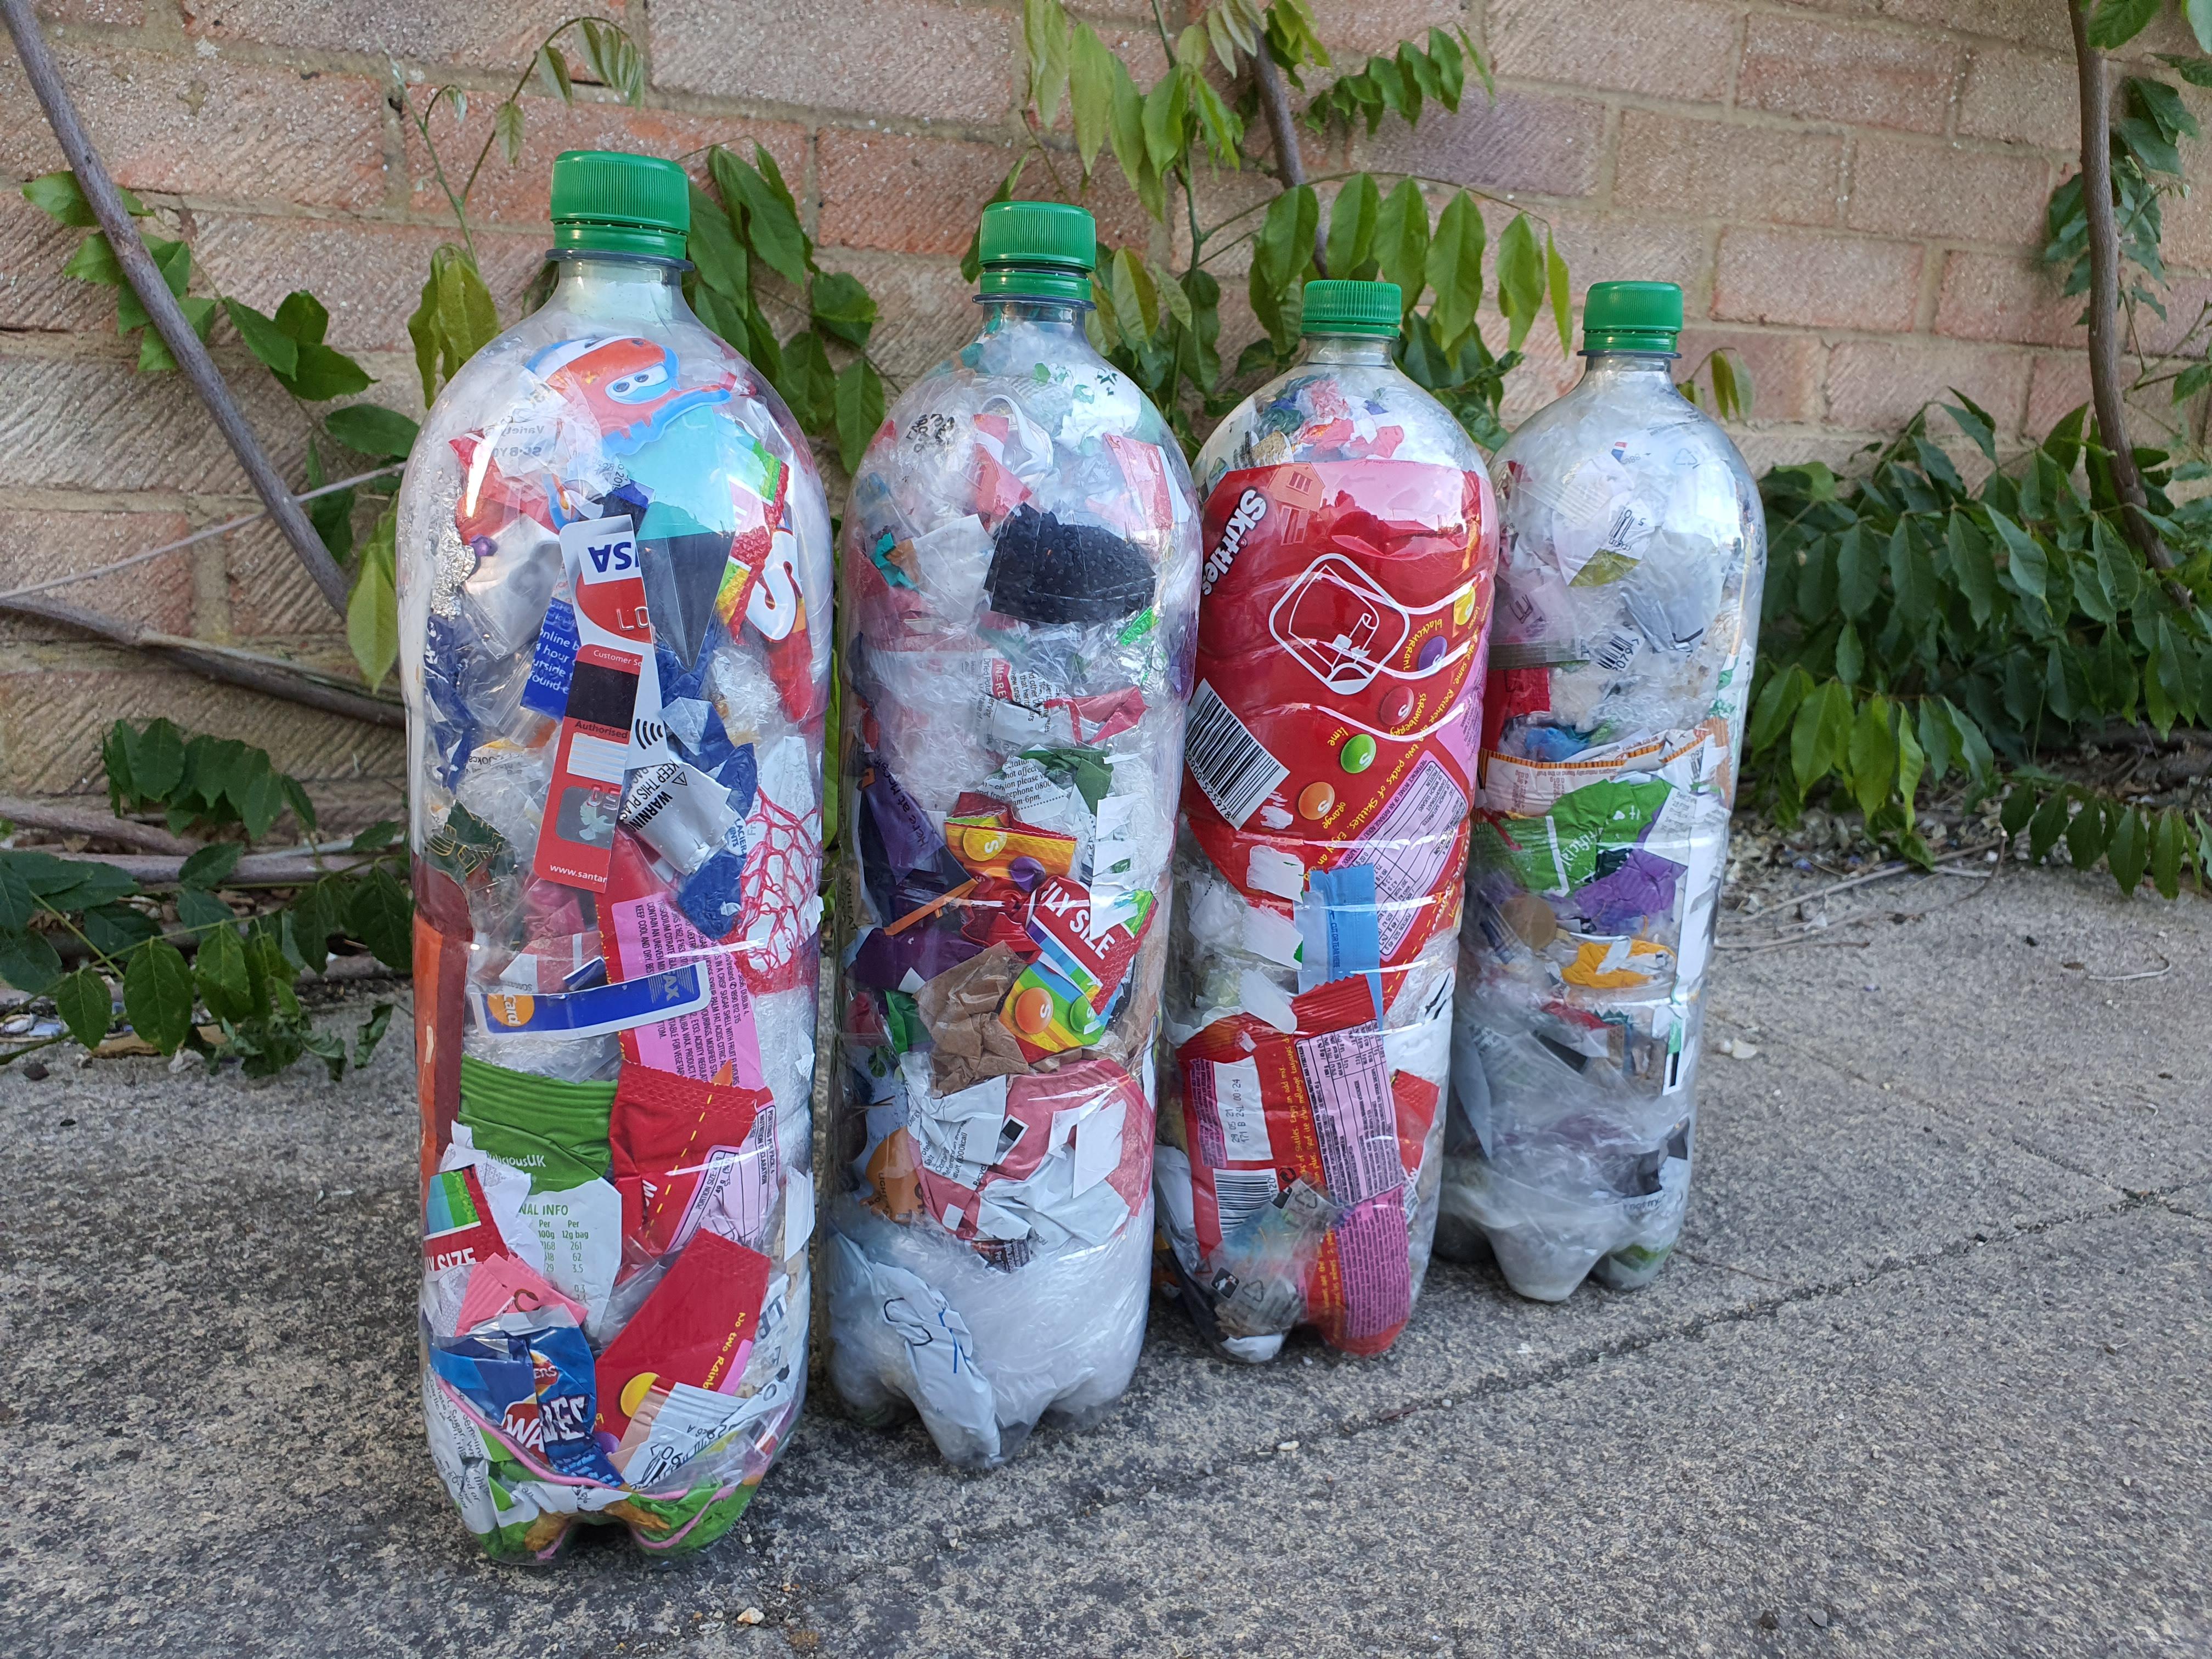 4 plastic bottles made into ecobricks against brick wall background